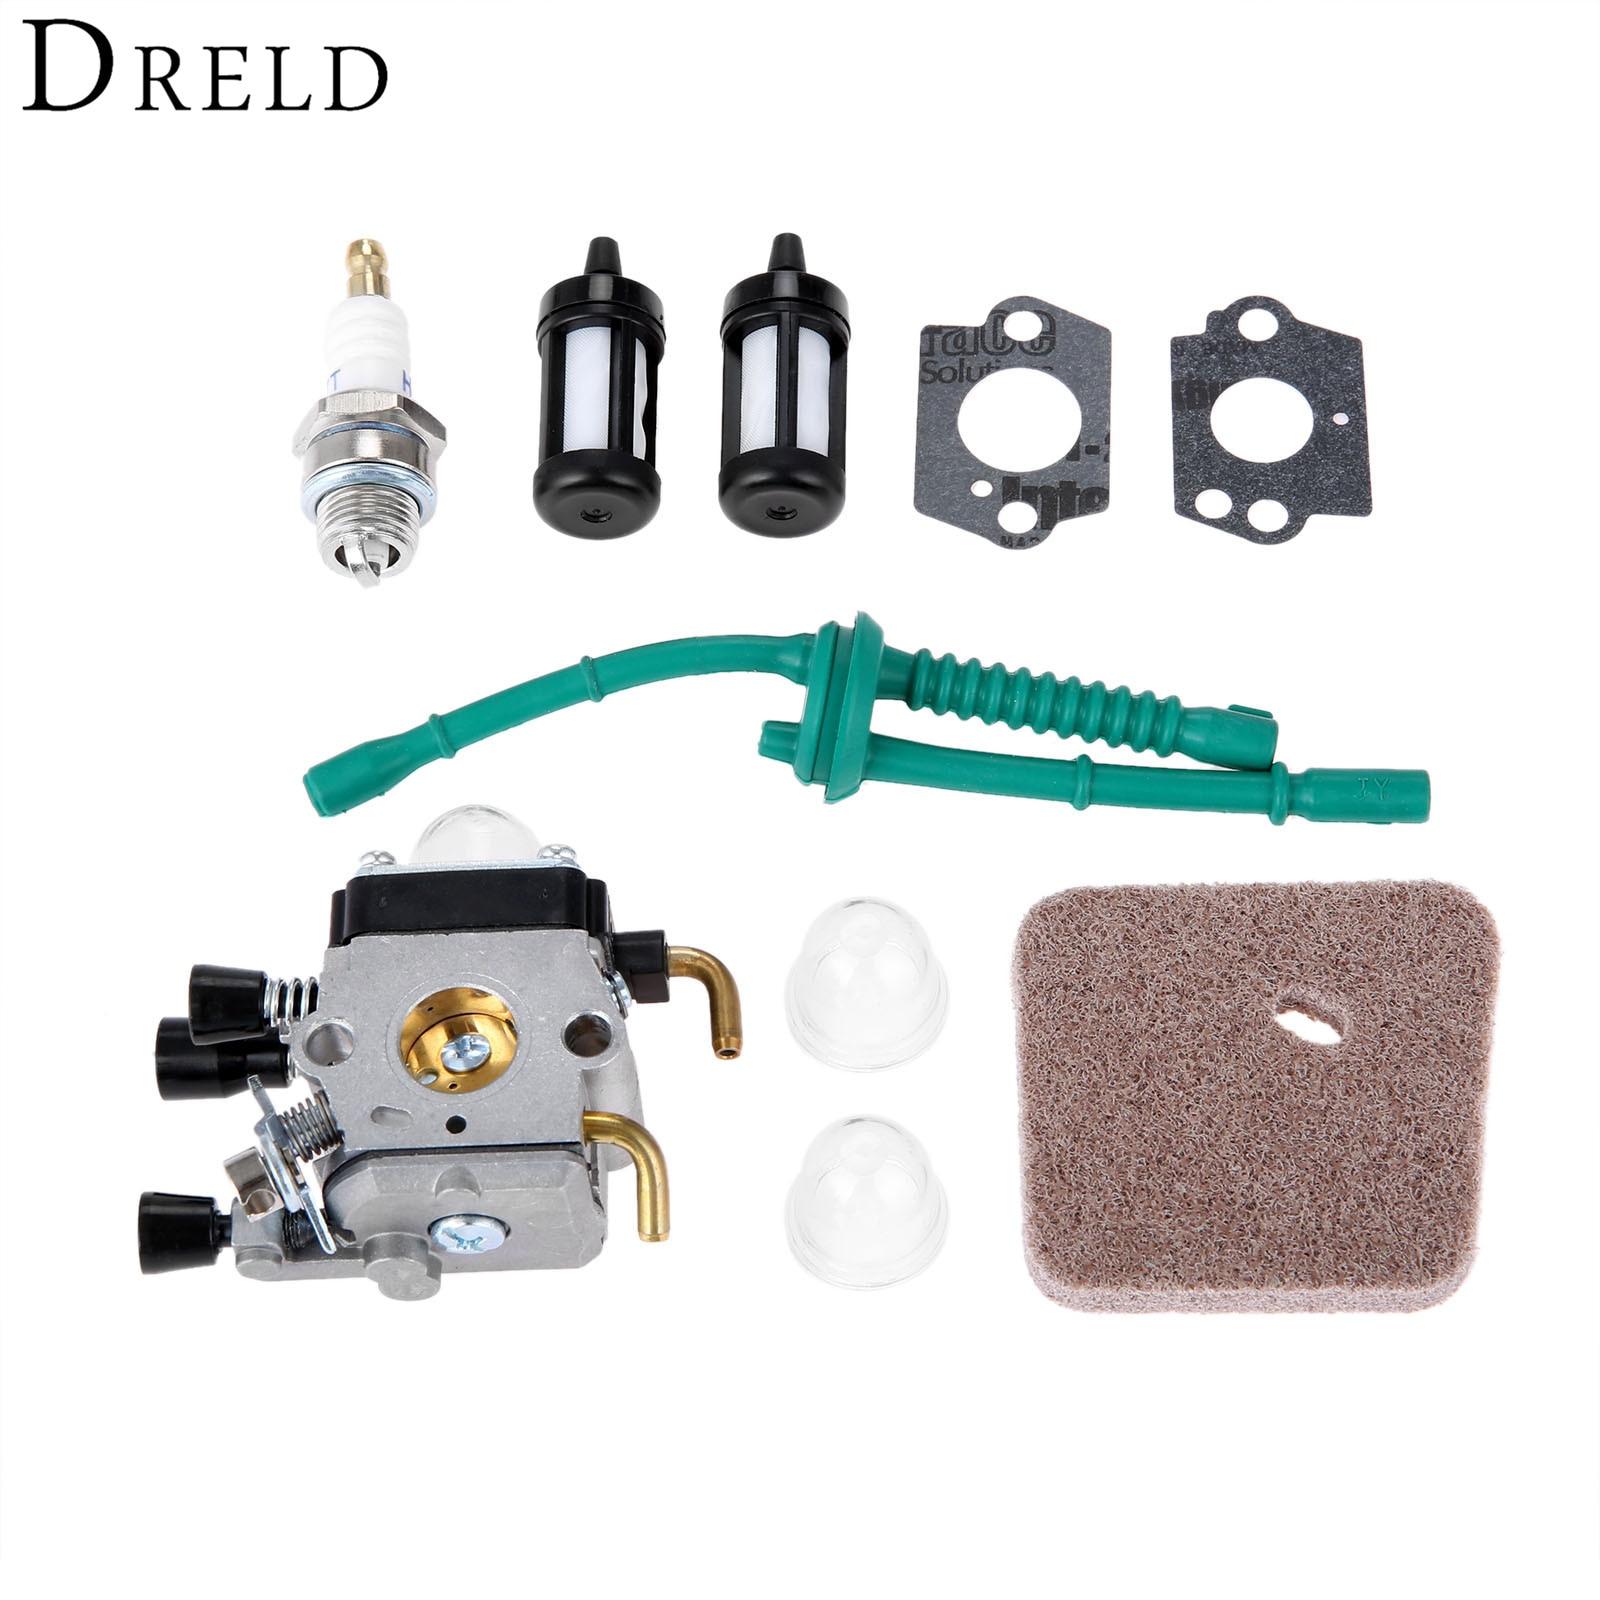 DRELD Carburetor Air Fuel Filter Spark Plug Carb Kit For STIHL FS38 FS45 FS46 FS55 FS55R FS55RC KM55 FS45C FS55T Trimmers Cutter цена